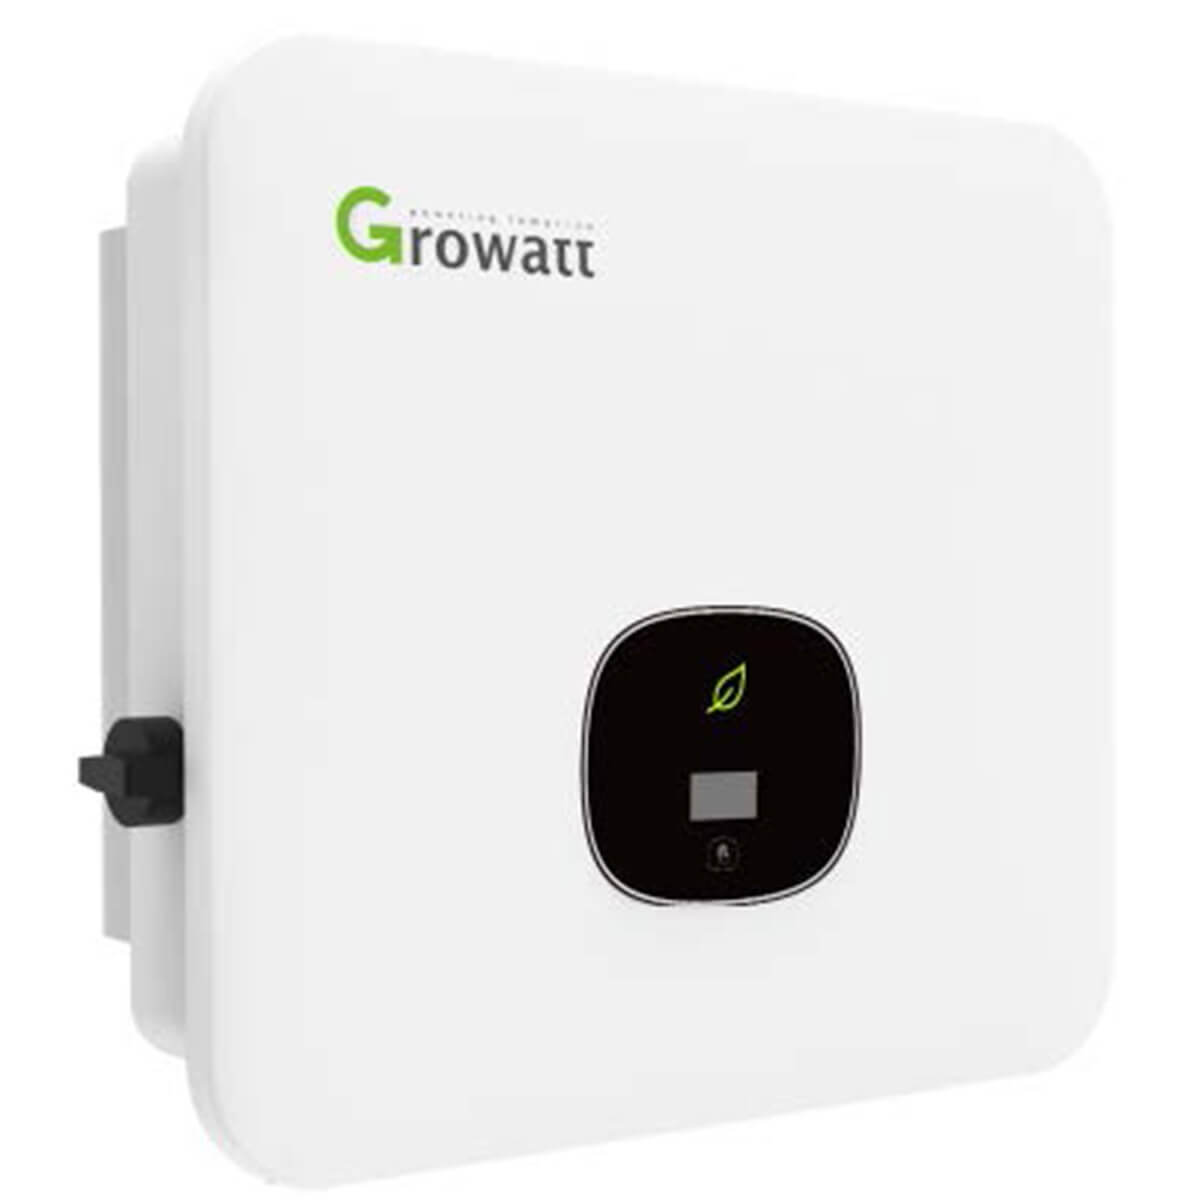 growatt 8000W inverter, growatt mod 8000W inverter, growatt mod 8000tl3-x inverter, growatt mod 8000tl3-x, growatt mod 8000 W